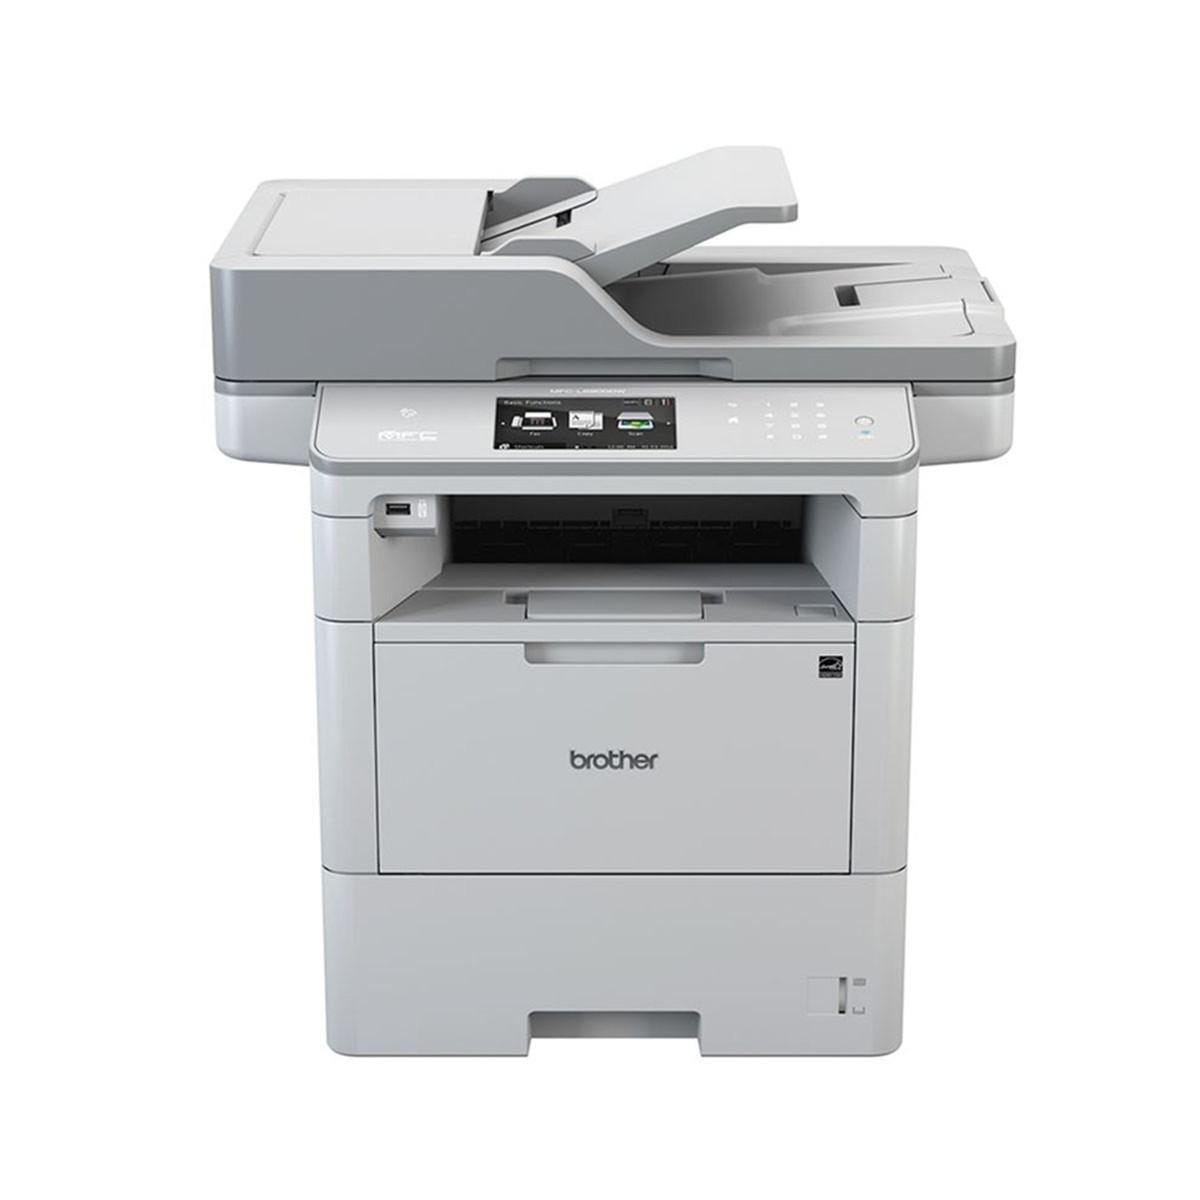 Impressora Brother MFC-L6902DW MFCL6902 Multifuncional Laser Monocromática com Wireless e Duplex